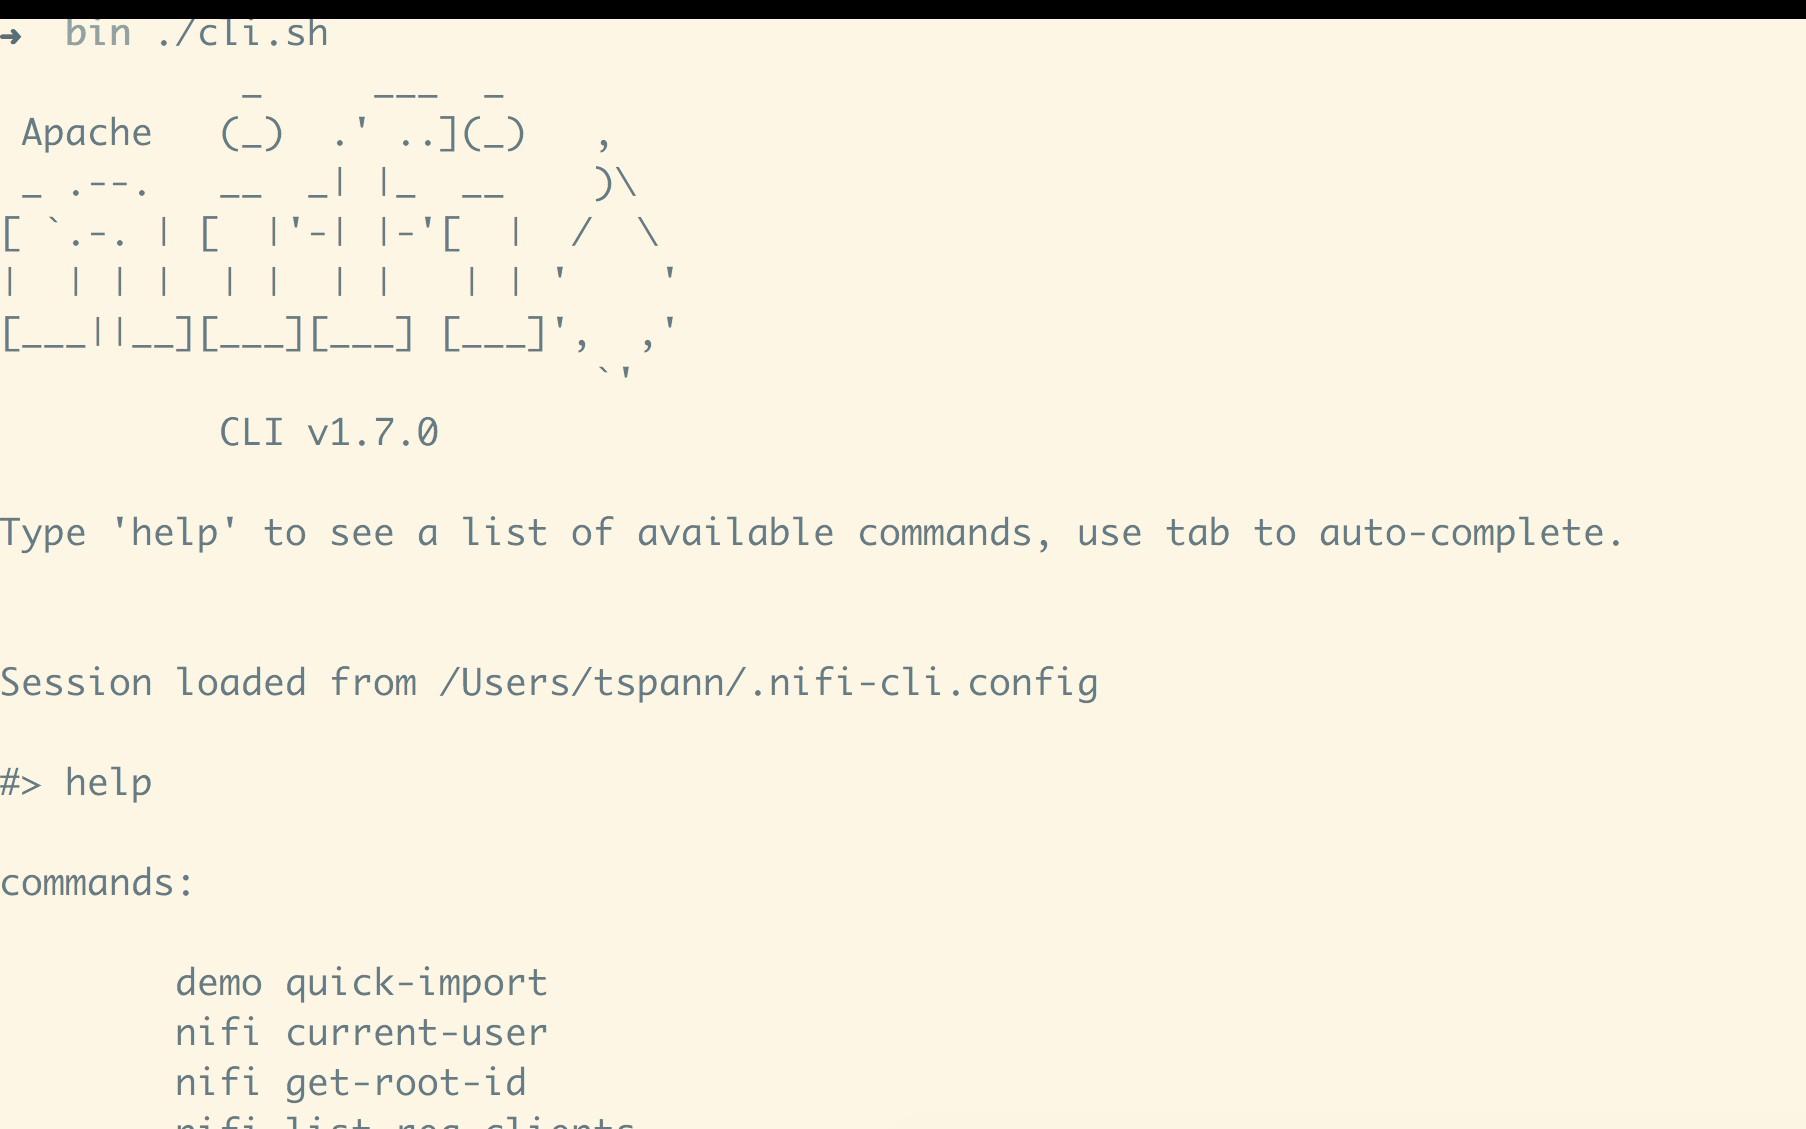 DevOps for Apache NiFi 1 7 and More - DZone Big Data